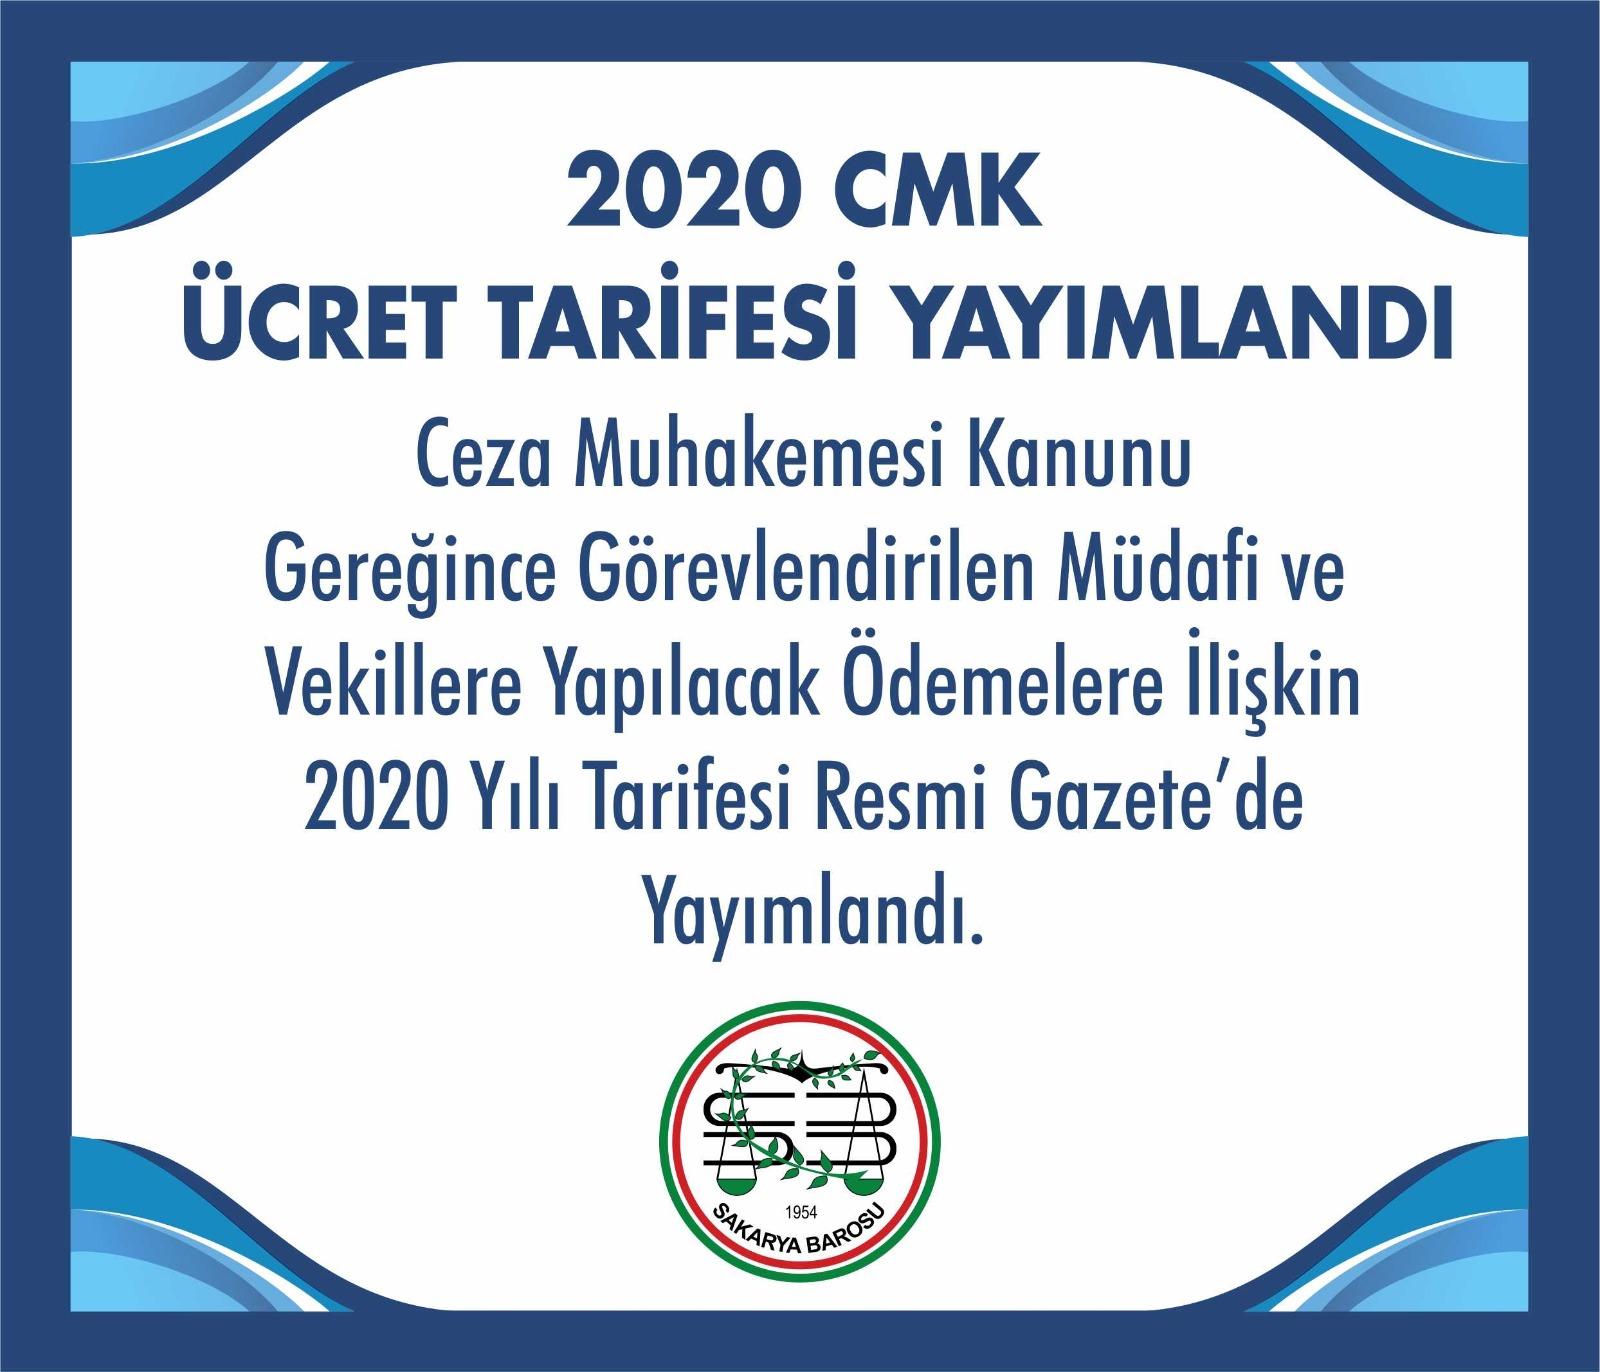 2020 cmk ucret tarifesi yayimlandi sakarya barosu